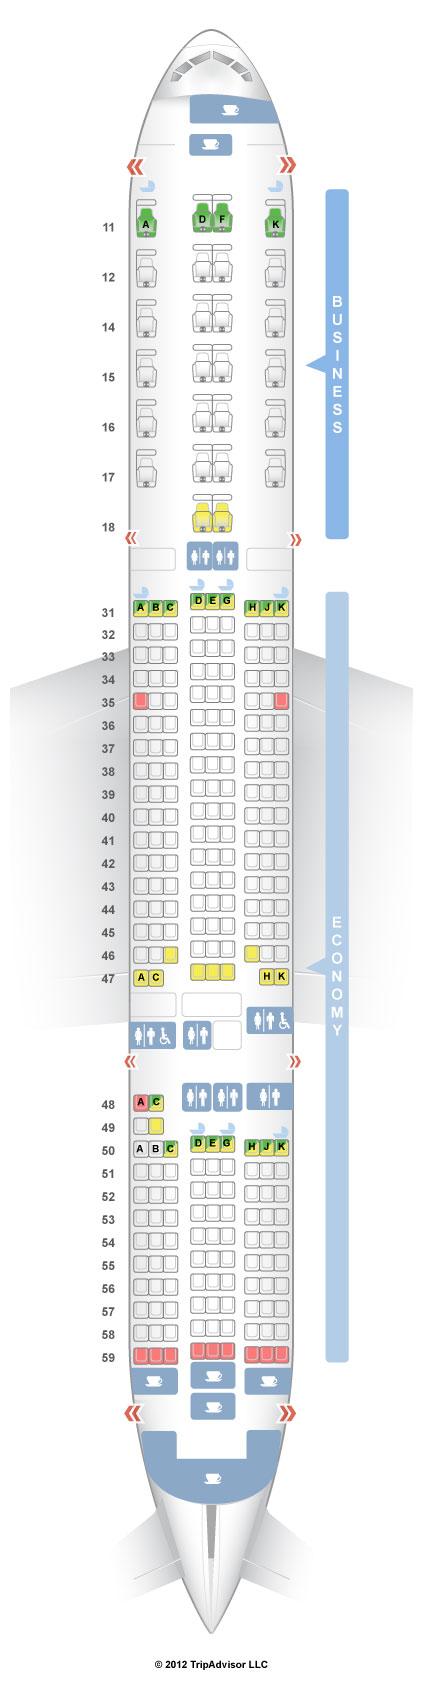 SeatGuru Seat Map Singapore Airlines Boeing 777-200ER (772) V1